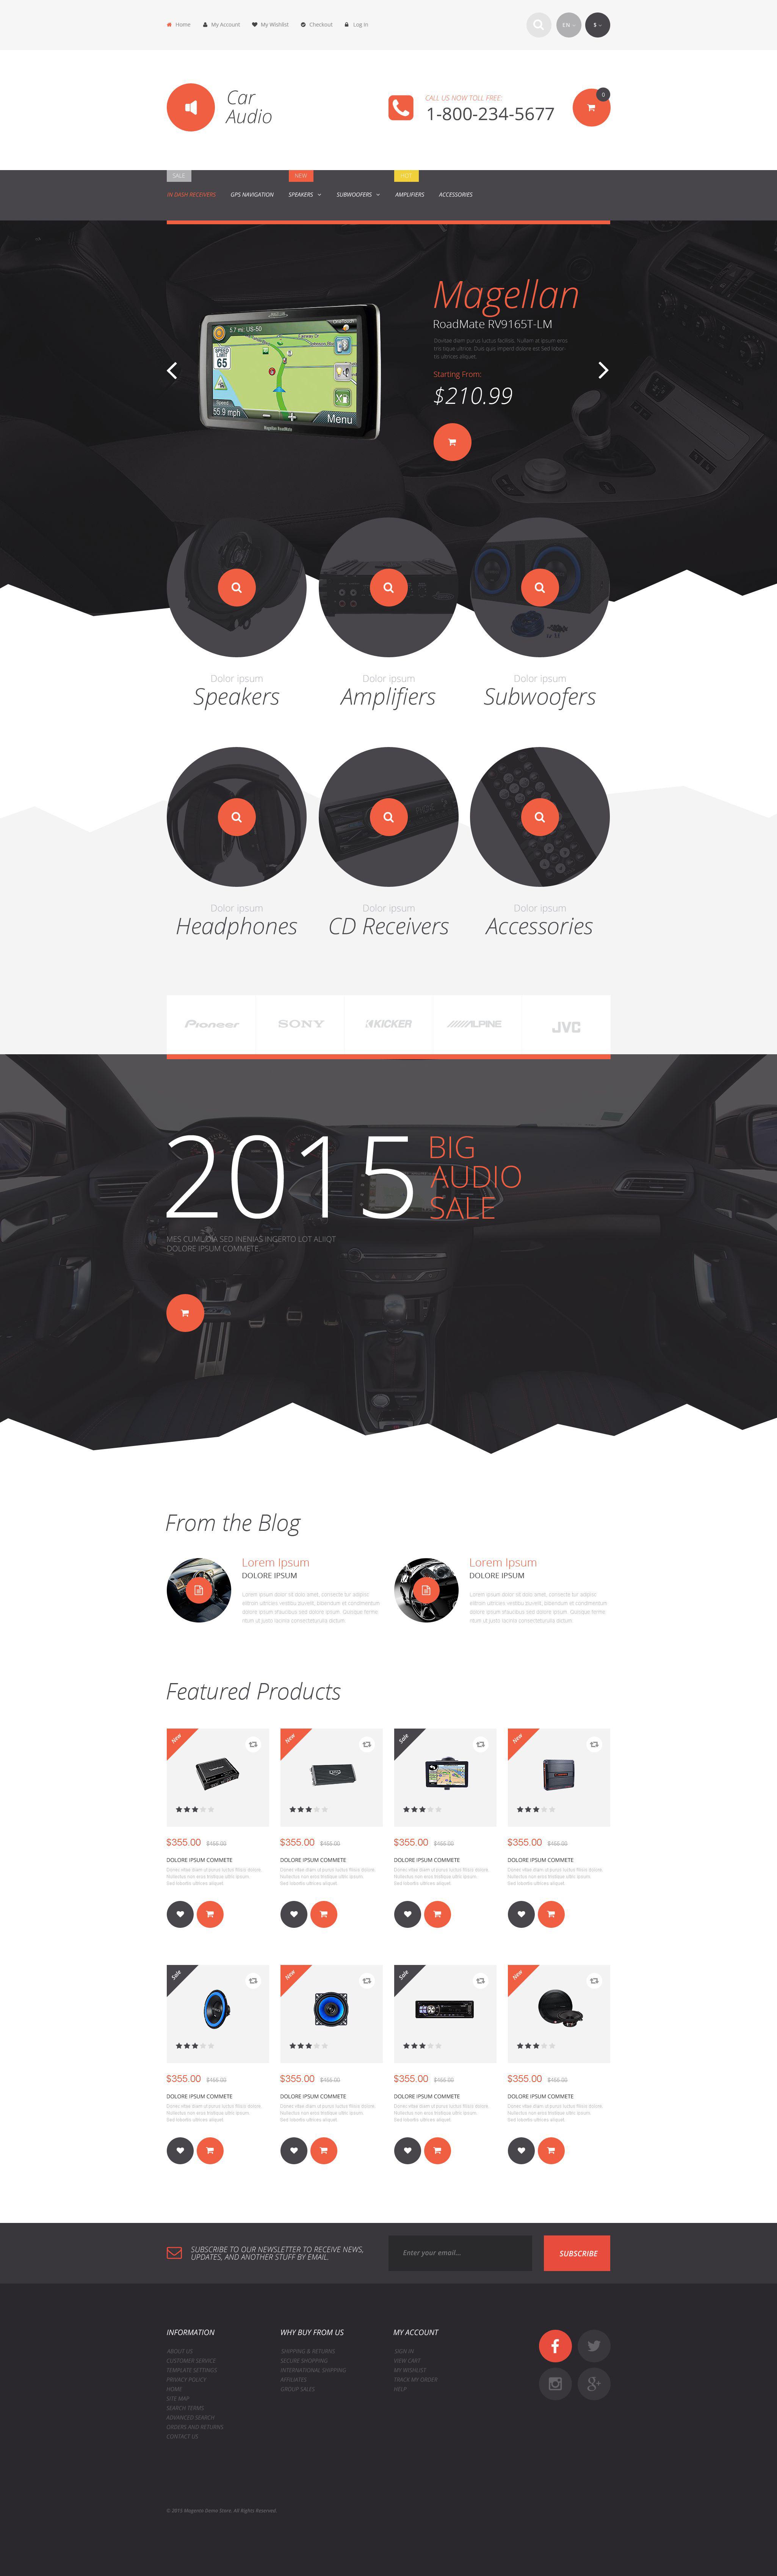 "Modello Magento Responsive #55217 ""Car Stereo"" - screenshot"